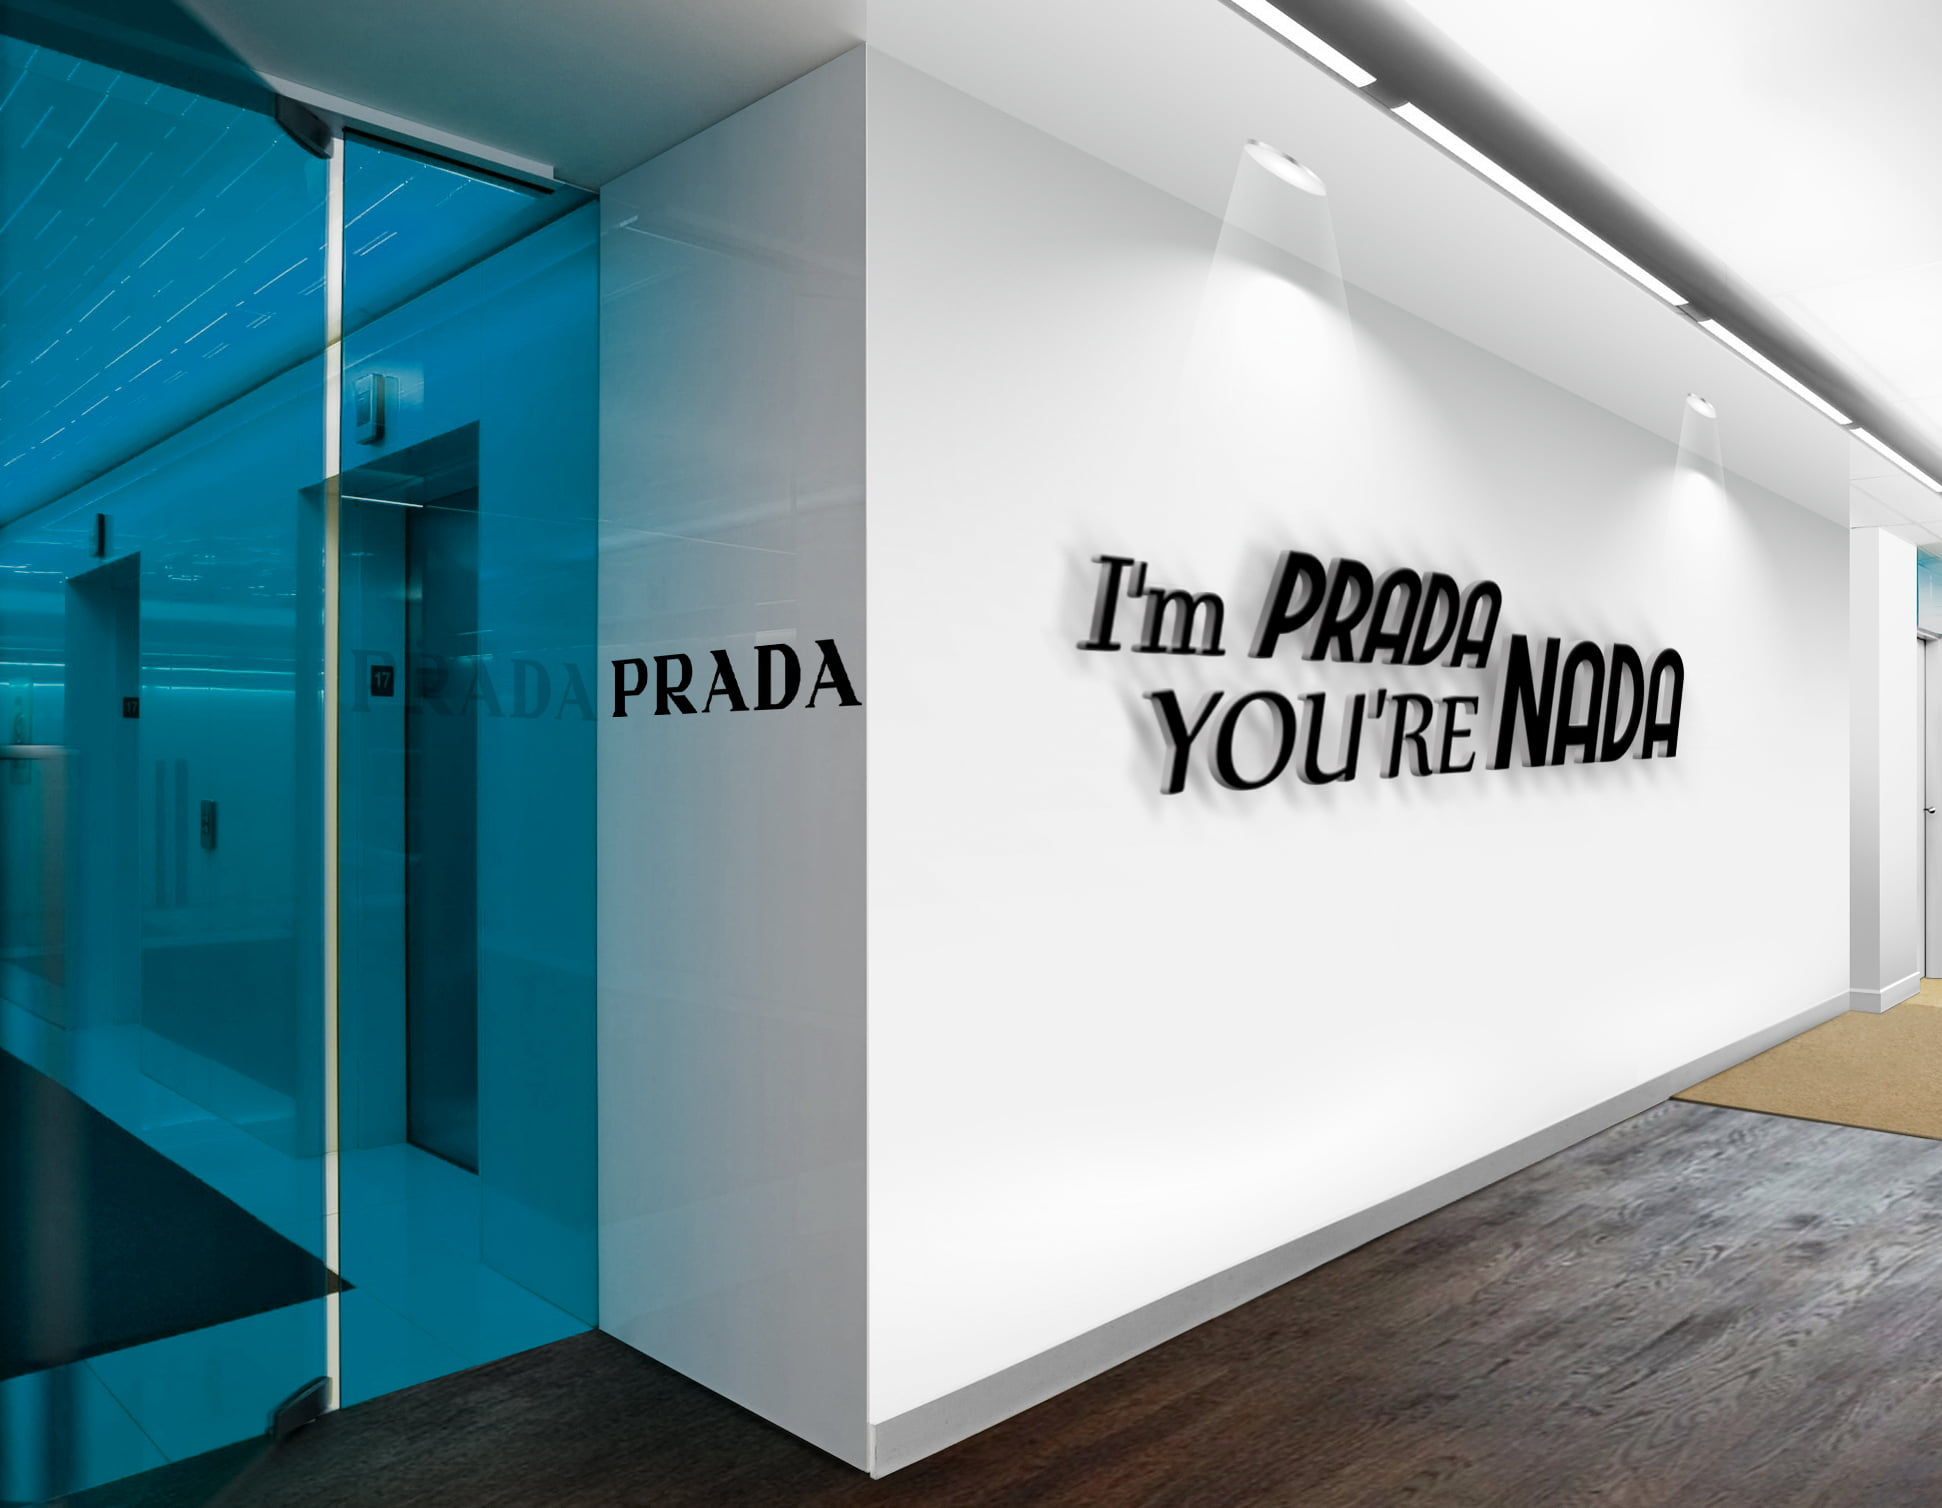 Prada-3D-Wall-Logo-&-Slogan-Mockup